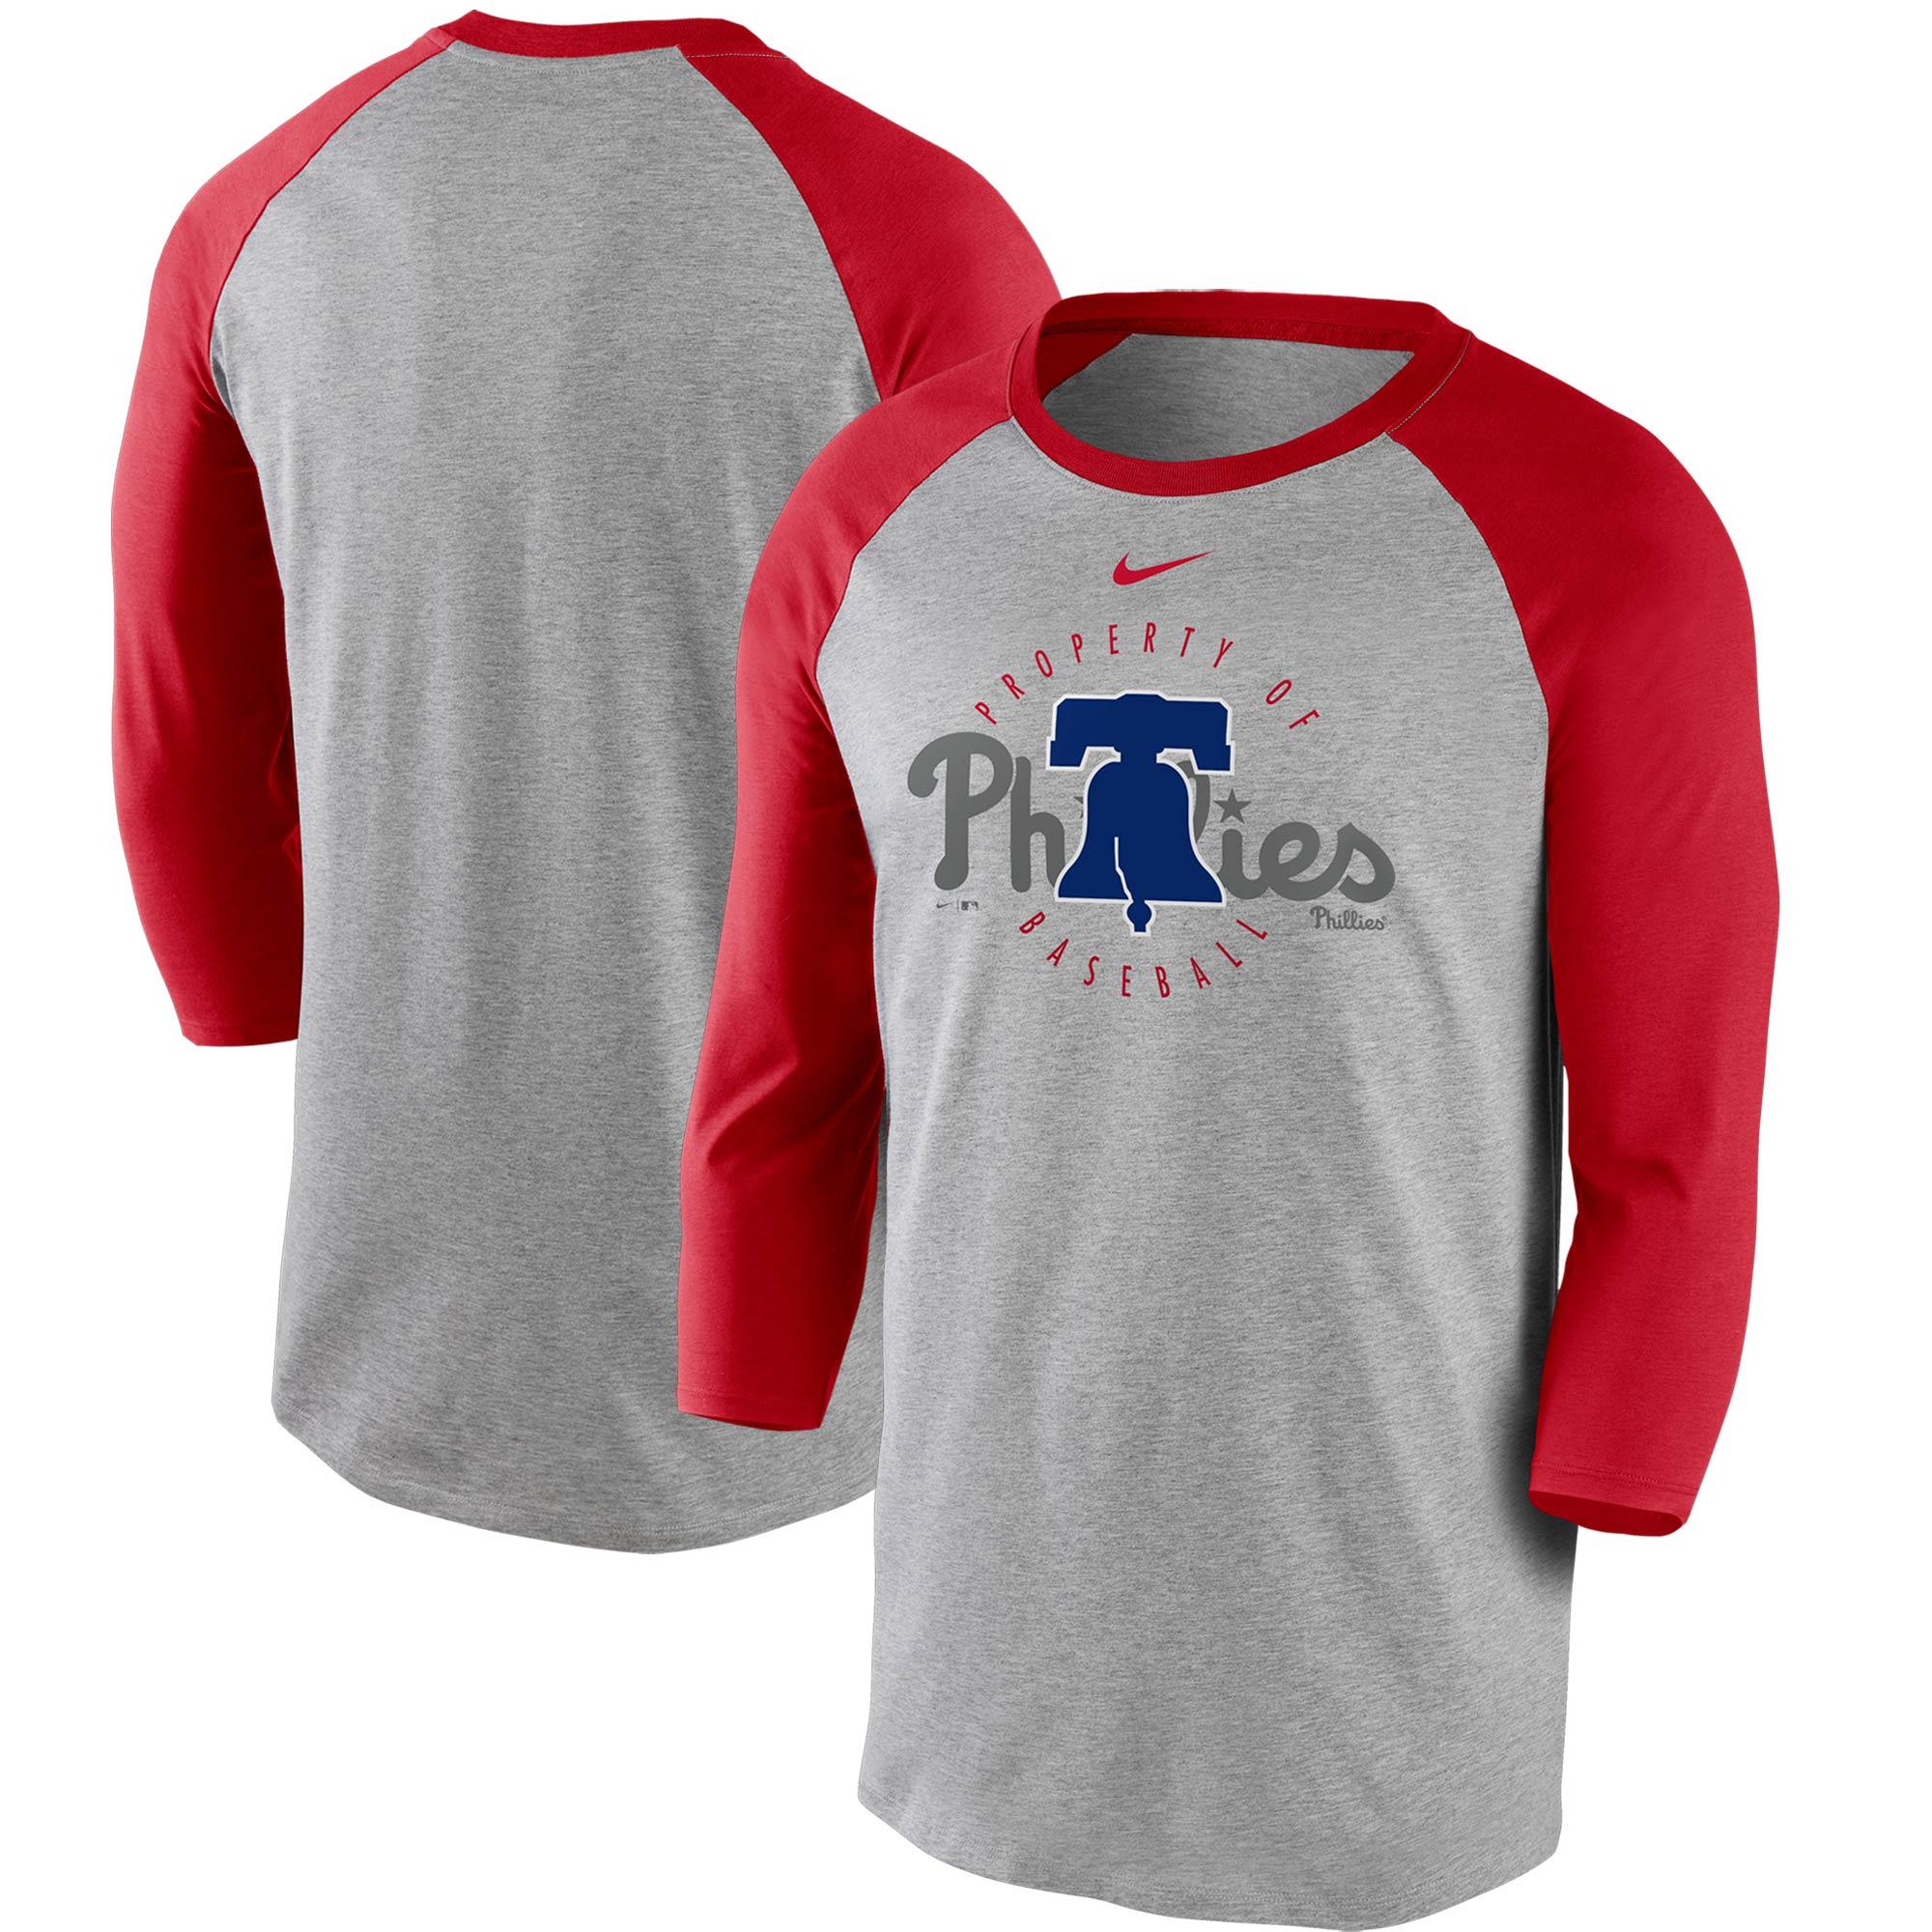 Philadelphia Phillies Nike Property Of Tri-Blend Raglan 3/4 Sleeve T-Shirt - Gray/Red